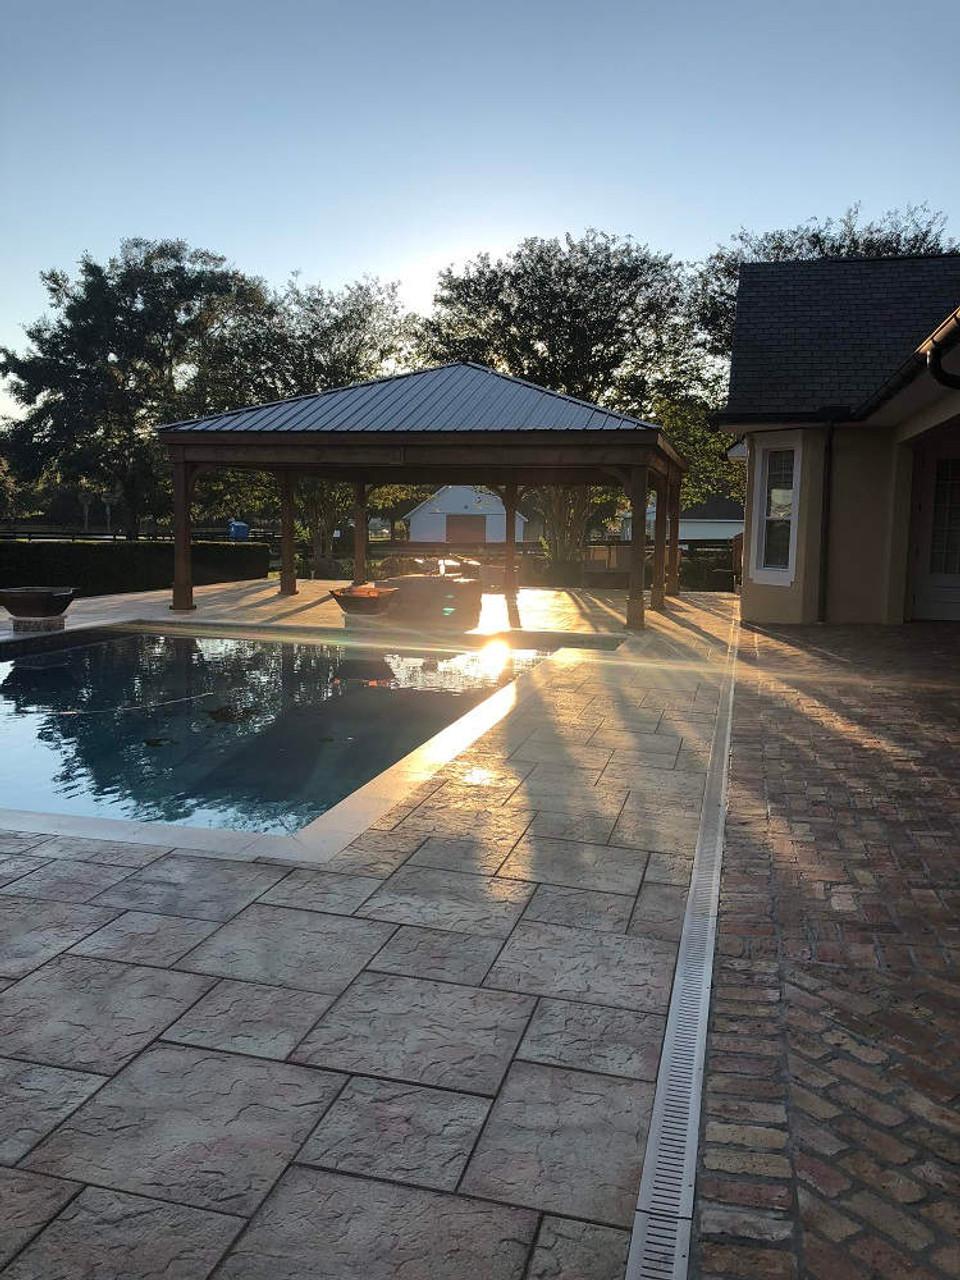 24x26 Red Cedar Trad'l Roof Pavilion Kit sunset, The Villages, FL